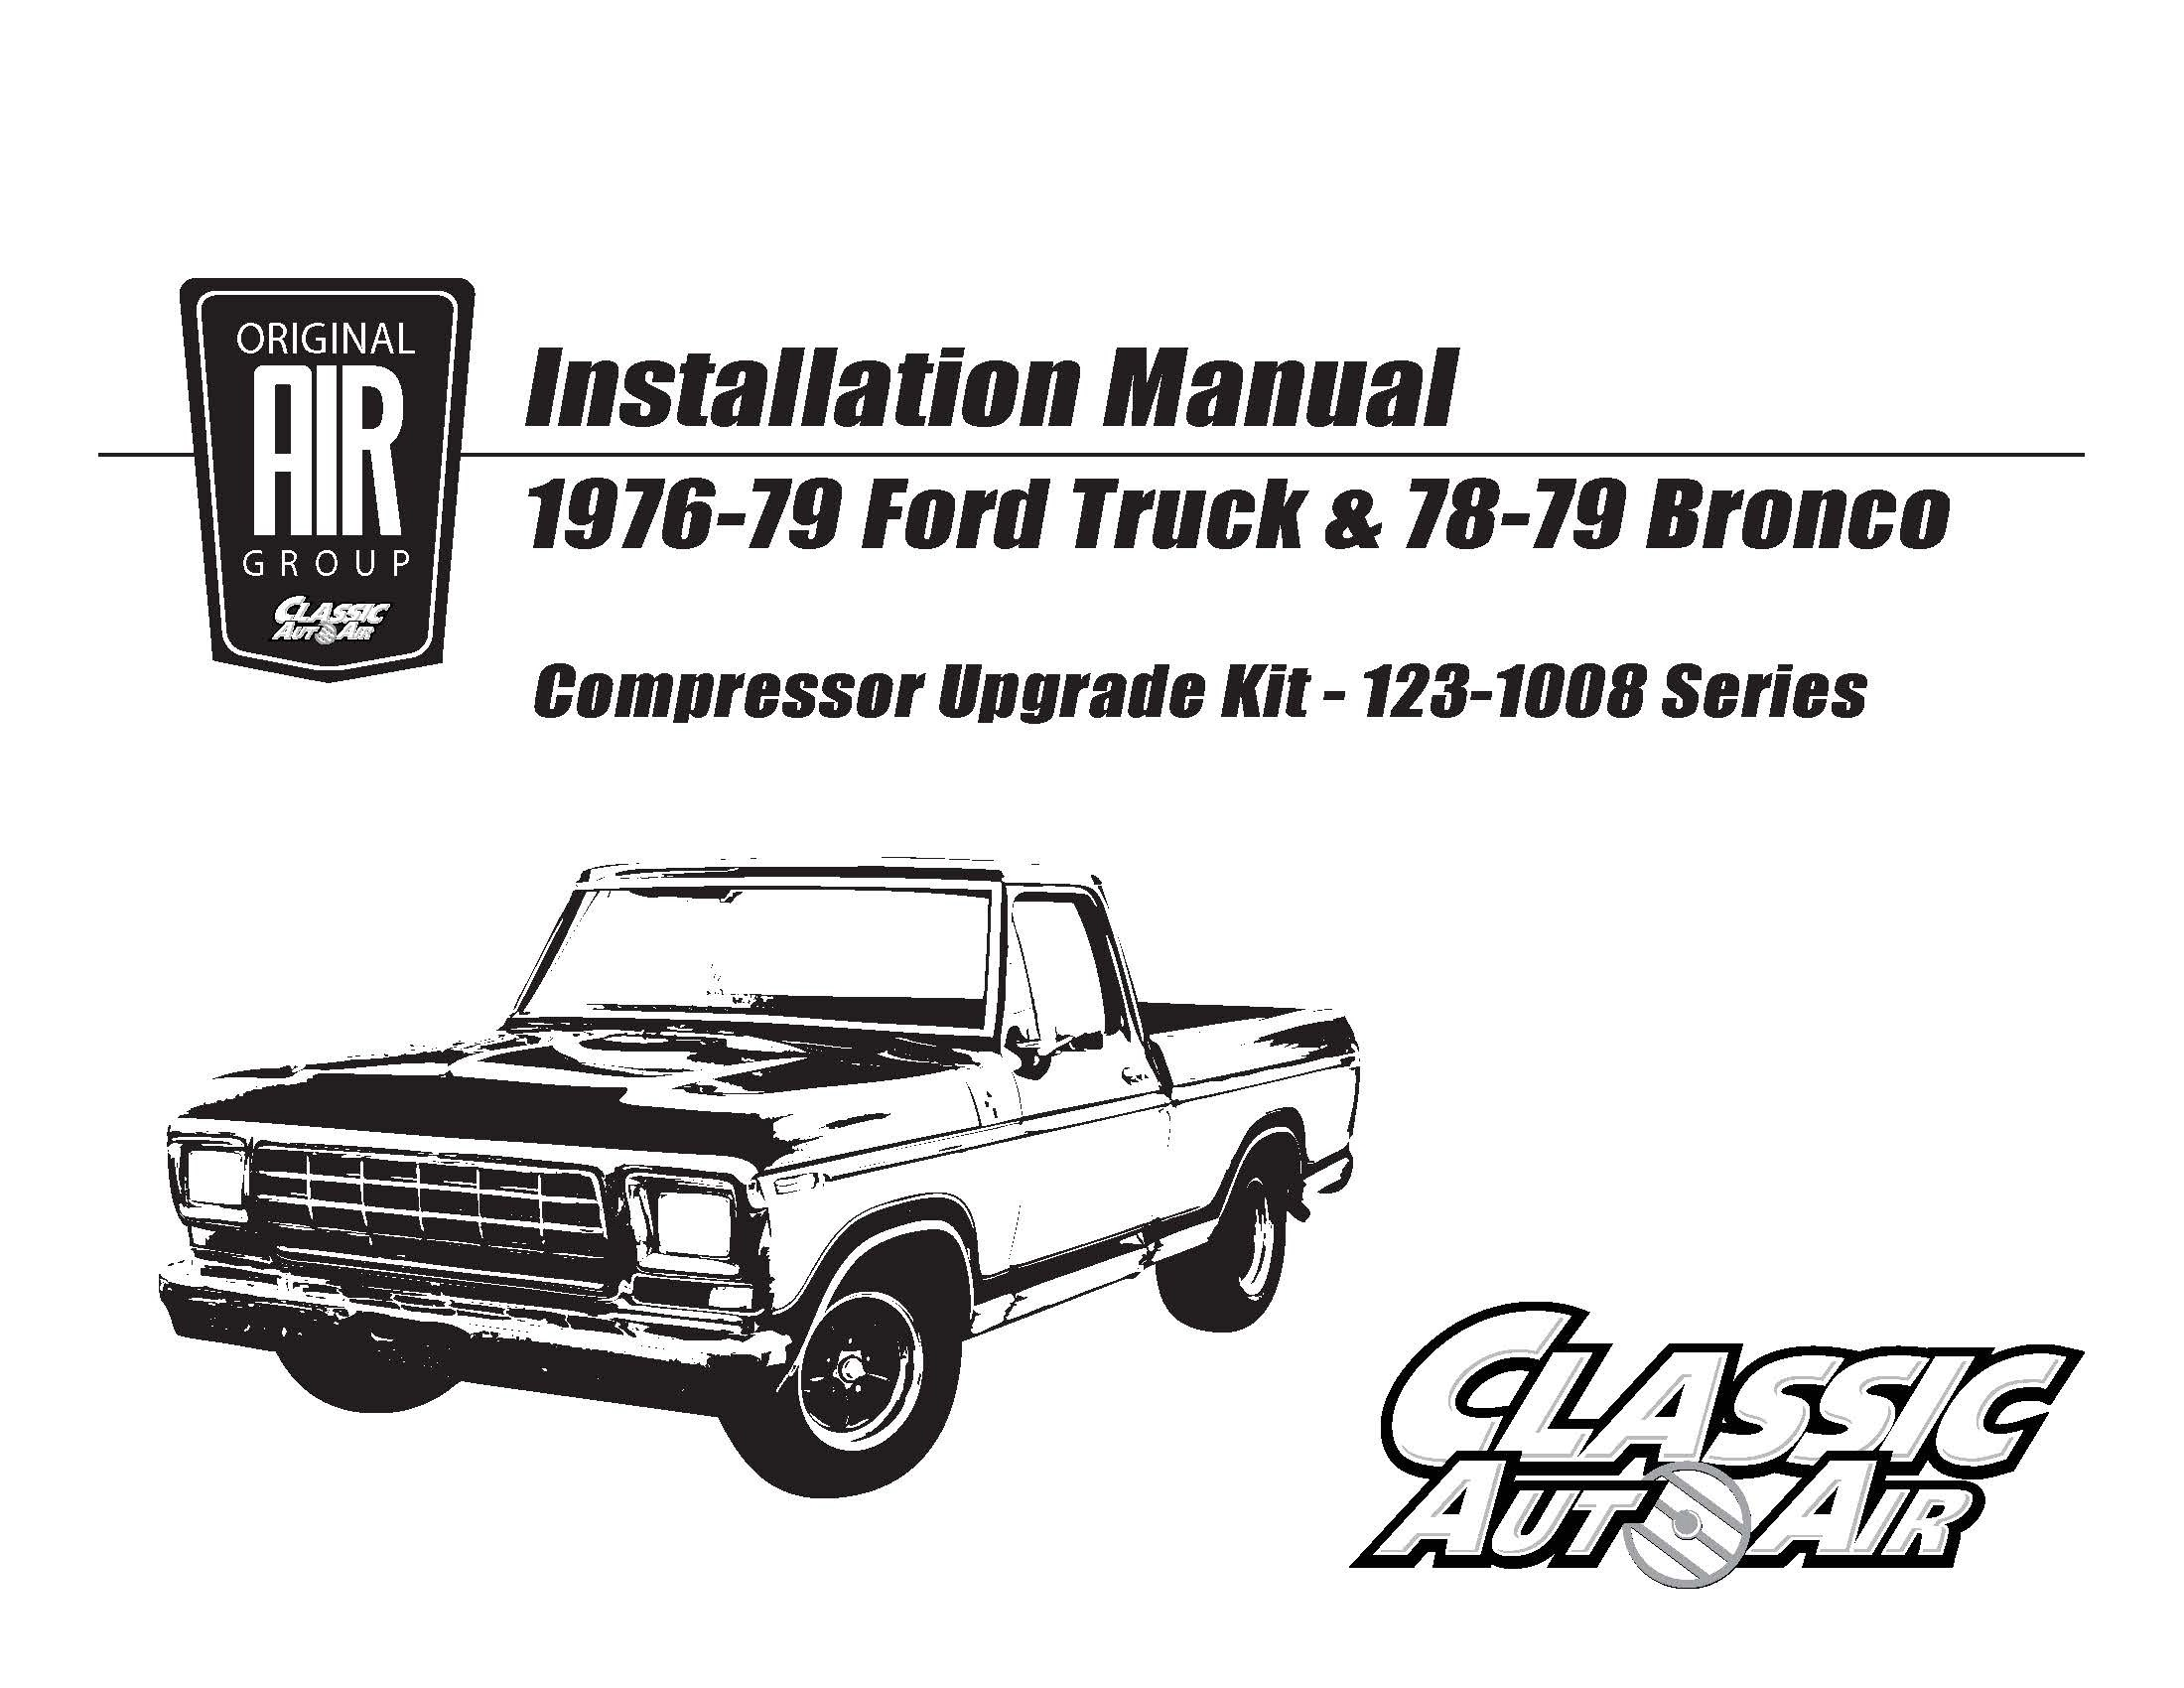 76-79 F-Series Truck/78-79 Bronco AC Compressor Kit V8 STAGE